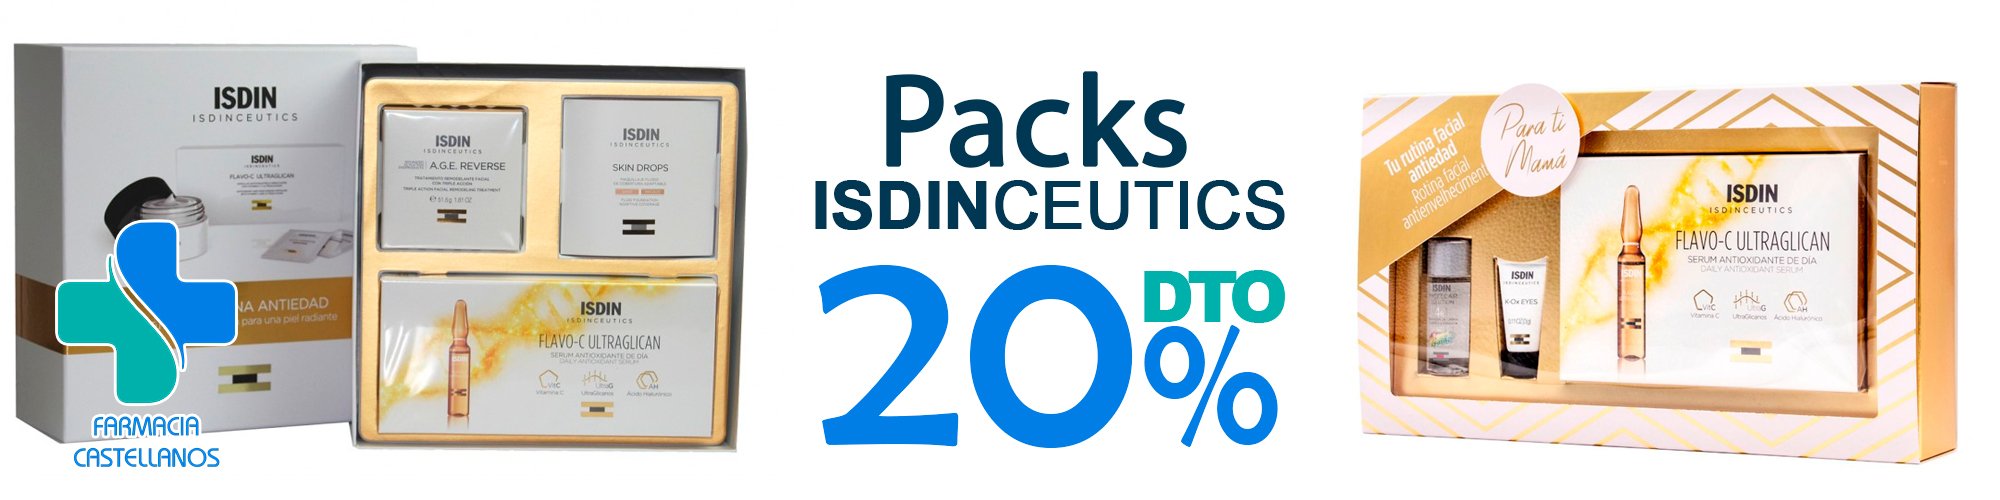 promocion-packs-isdinceutics-farmaciabeatrizcastellanos